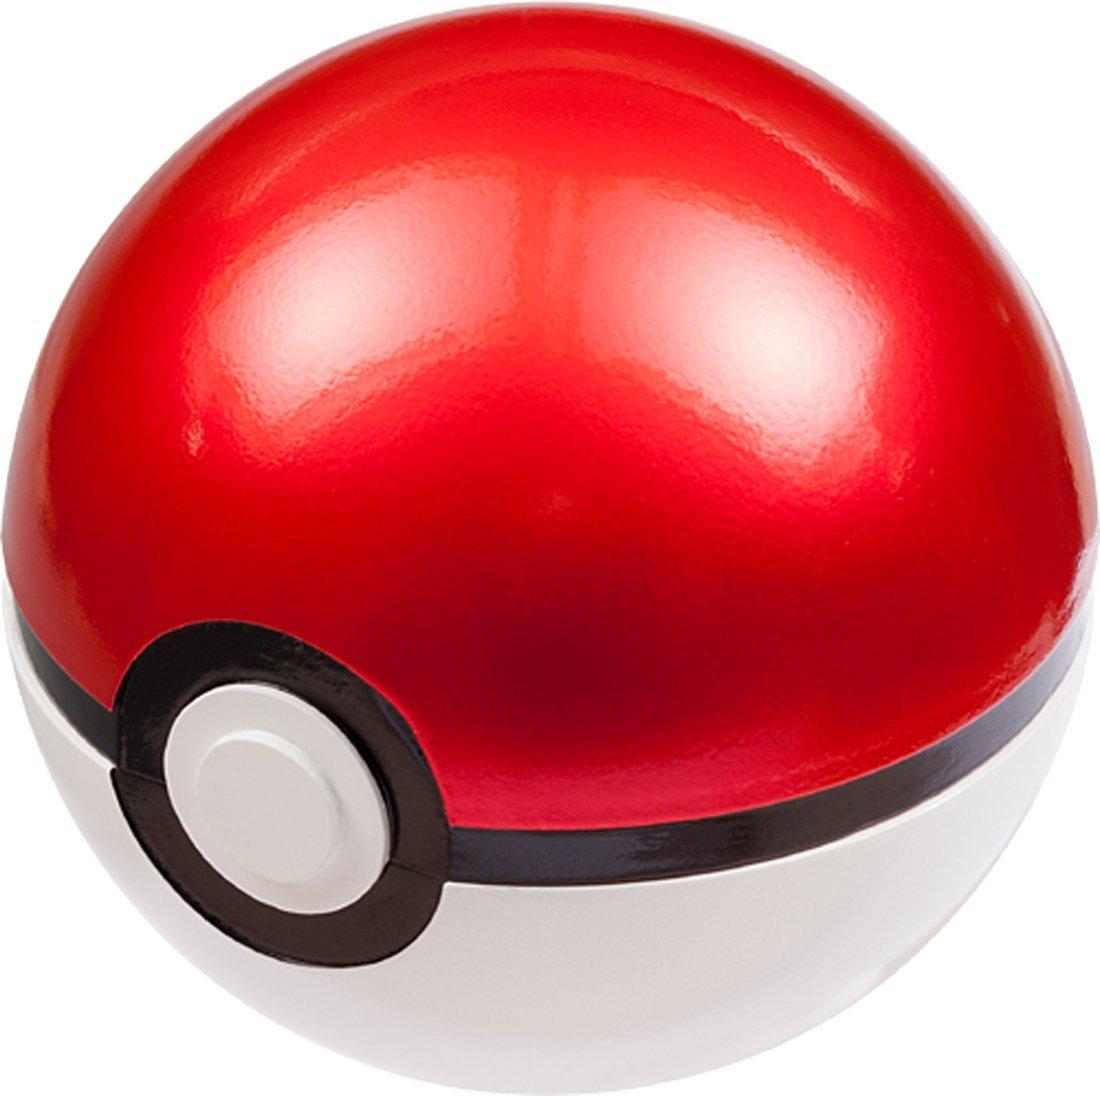 Pokeball ของแท้ JP - Takara Tomy Moncolle [โมเดลโปเกบอล]